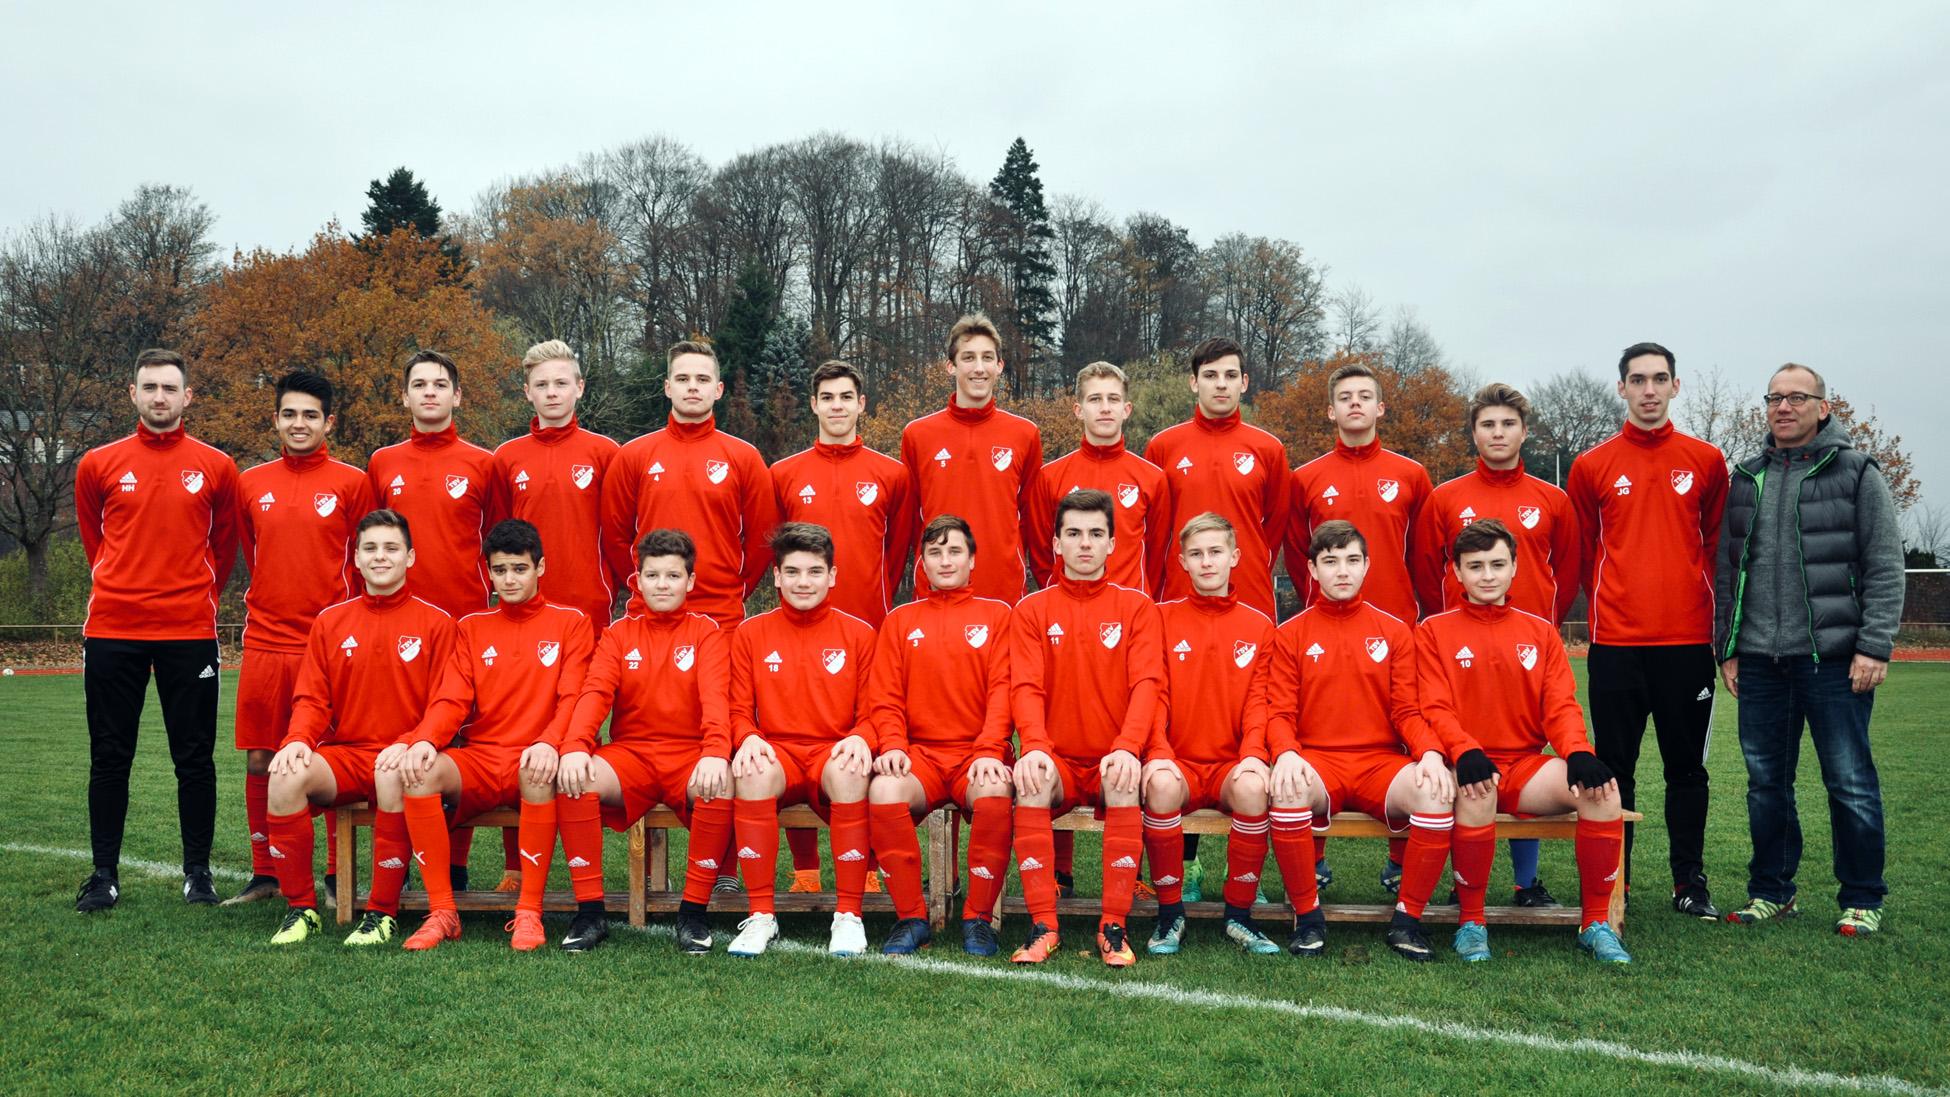 U19 – Jahrgang 2001/02